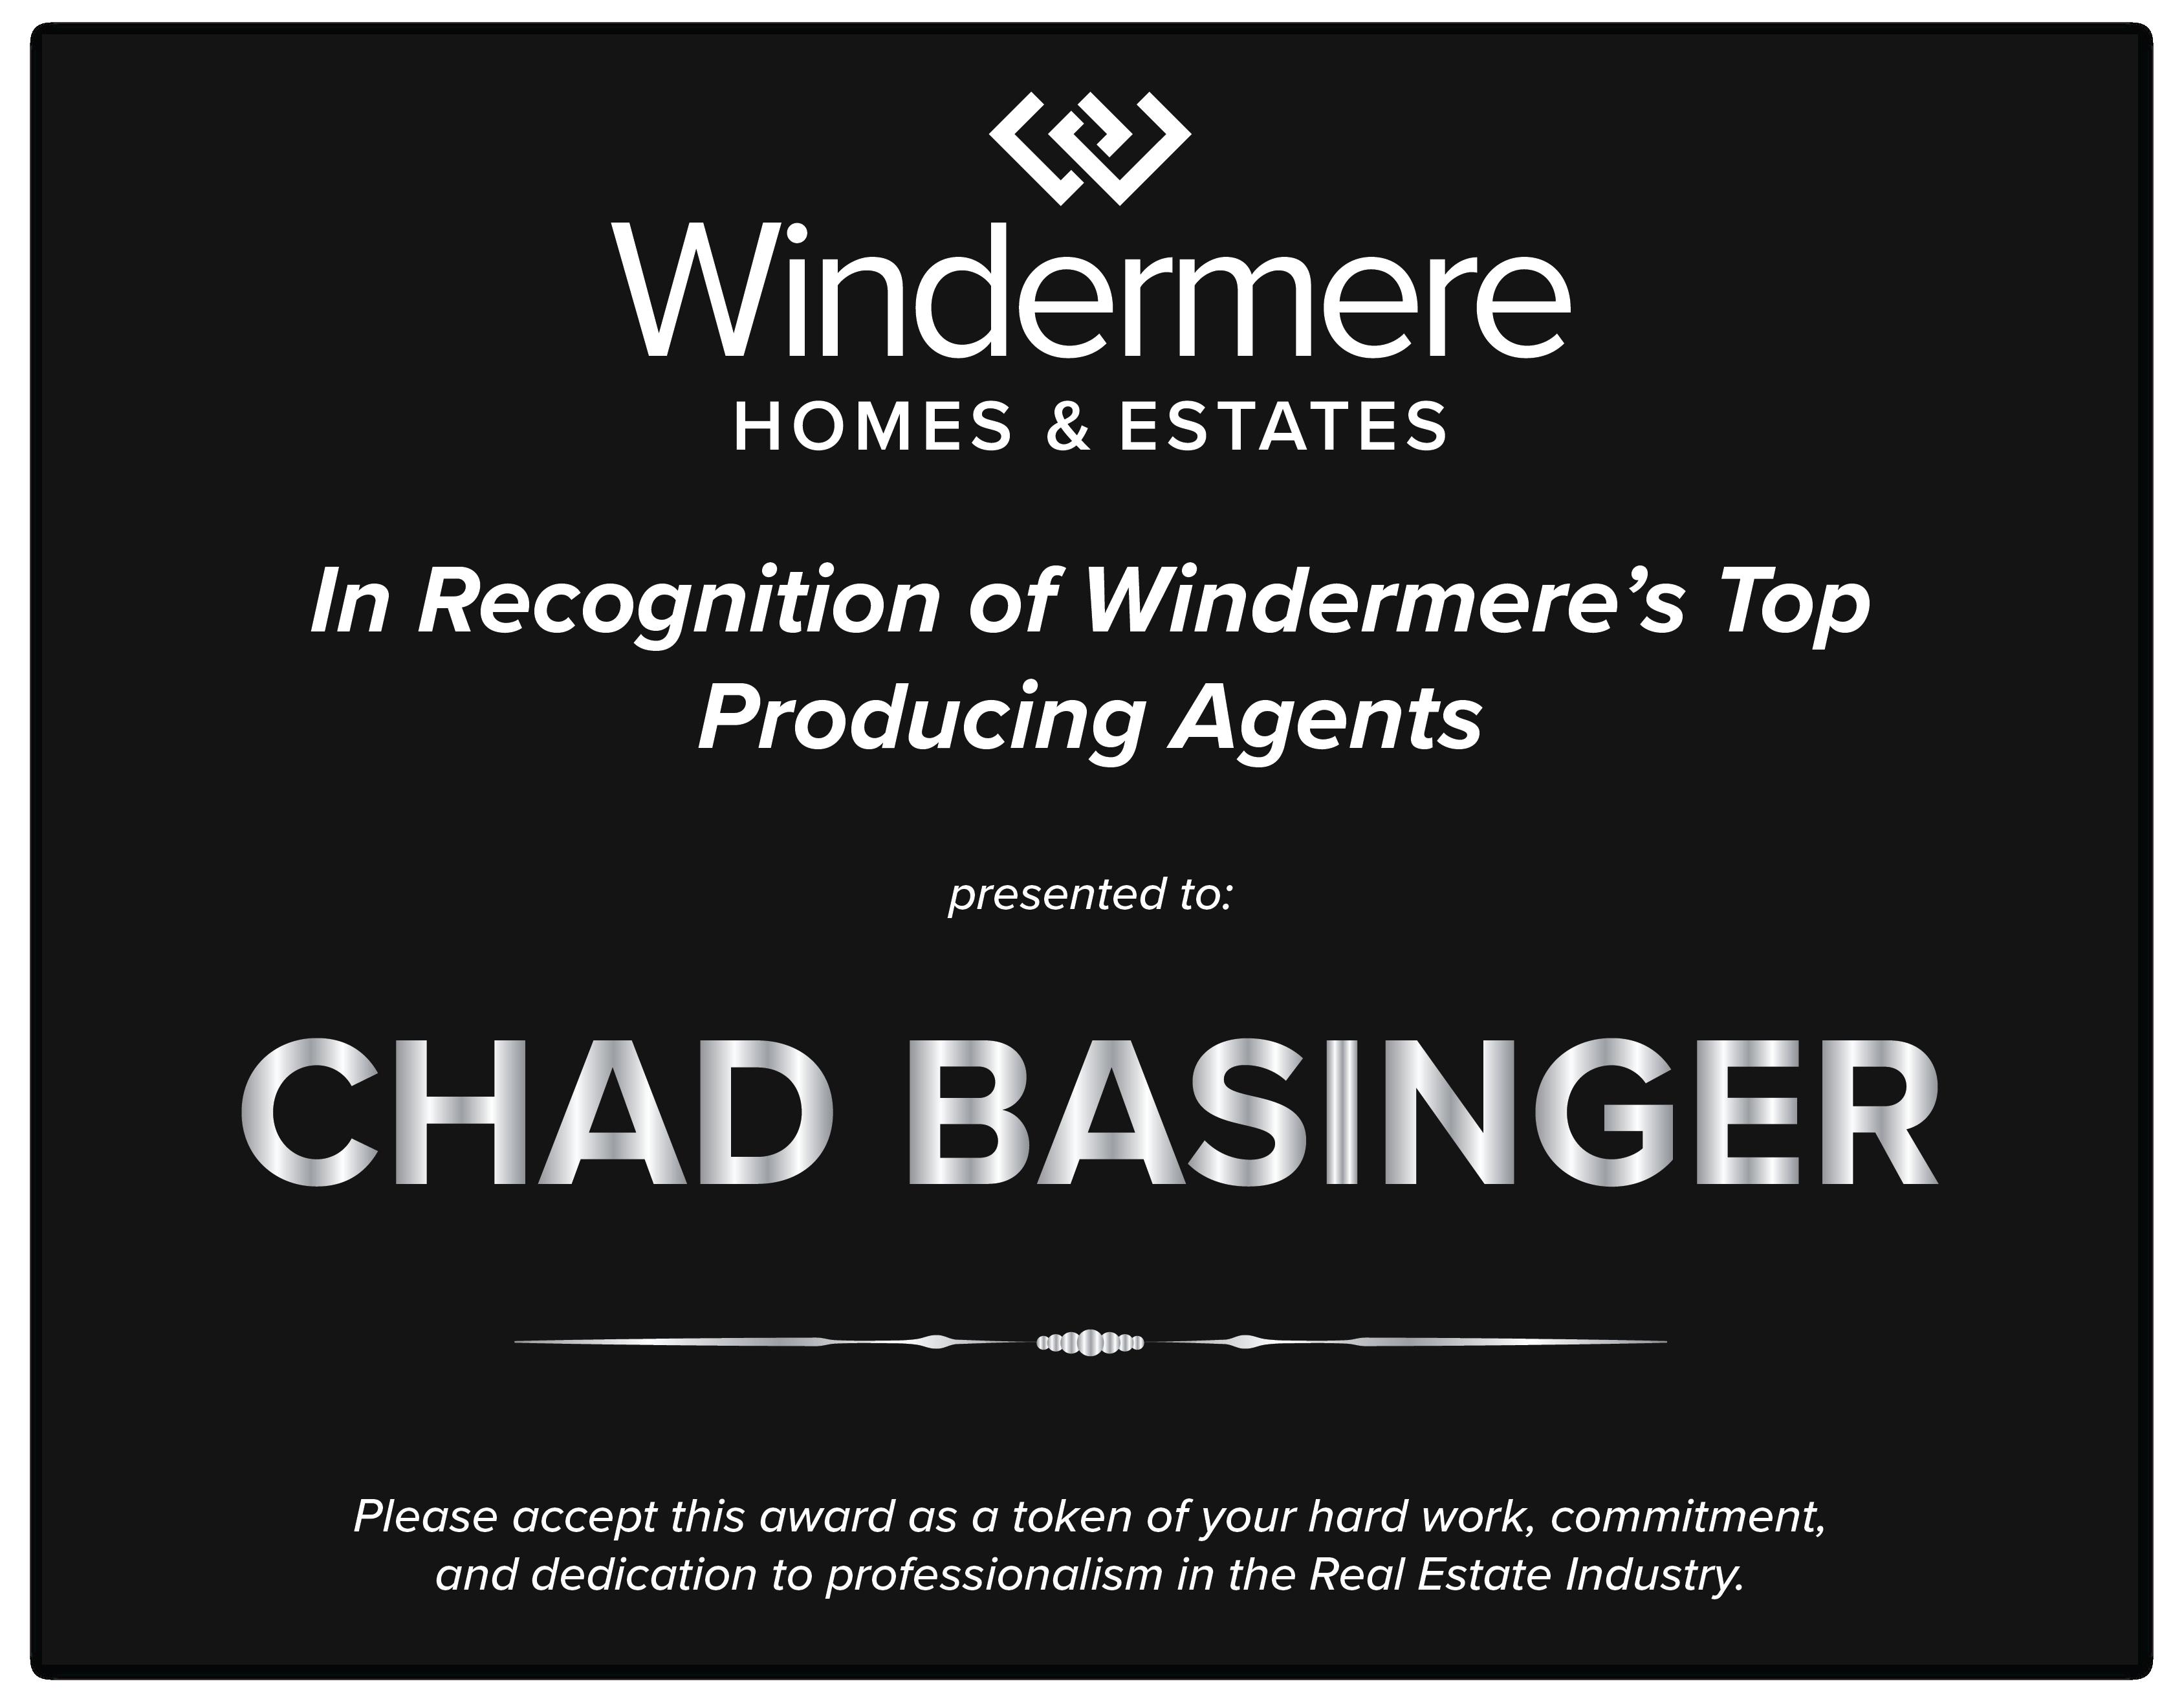 CHAD BASINGER-01